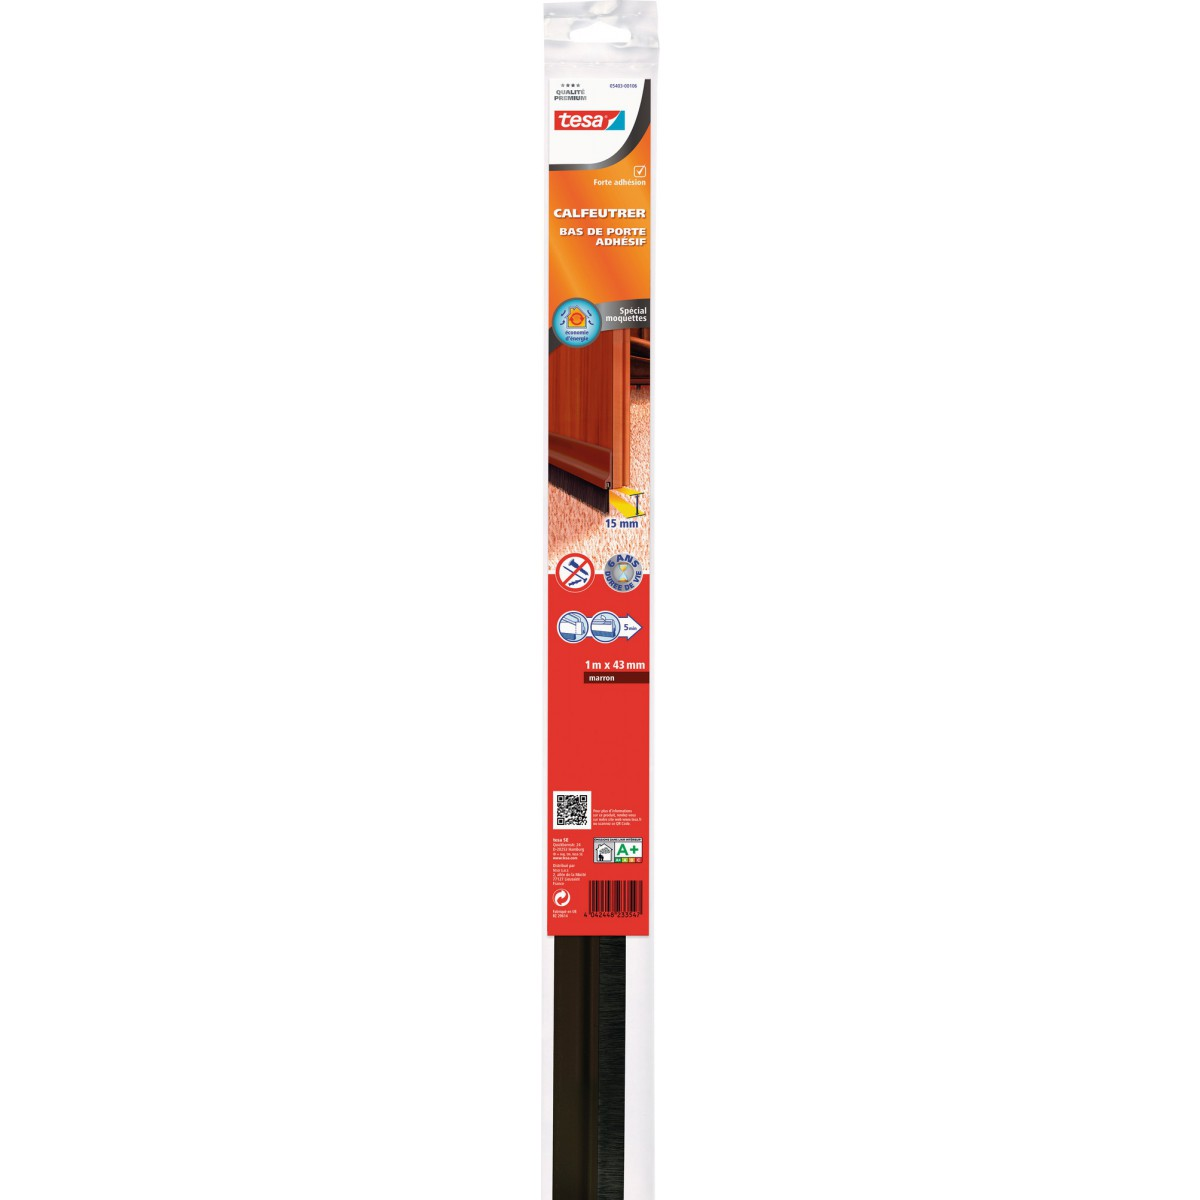 Bas de porte adhésif  spécial moquettes Tesa - 1 m - Brun